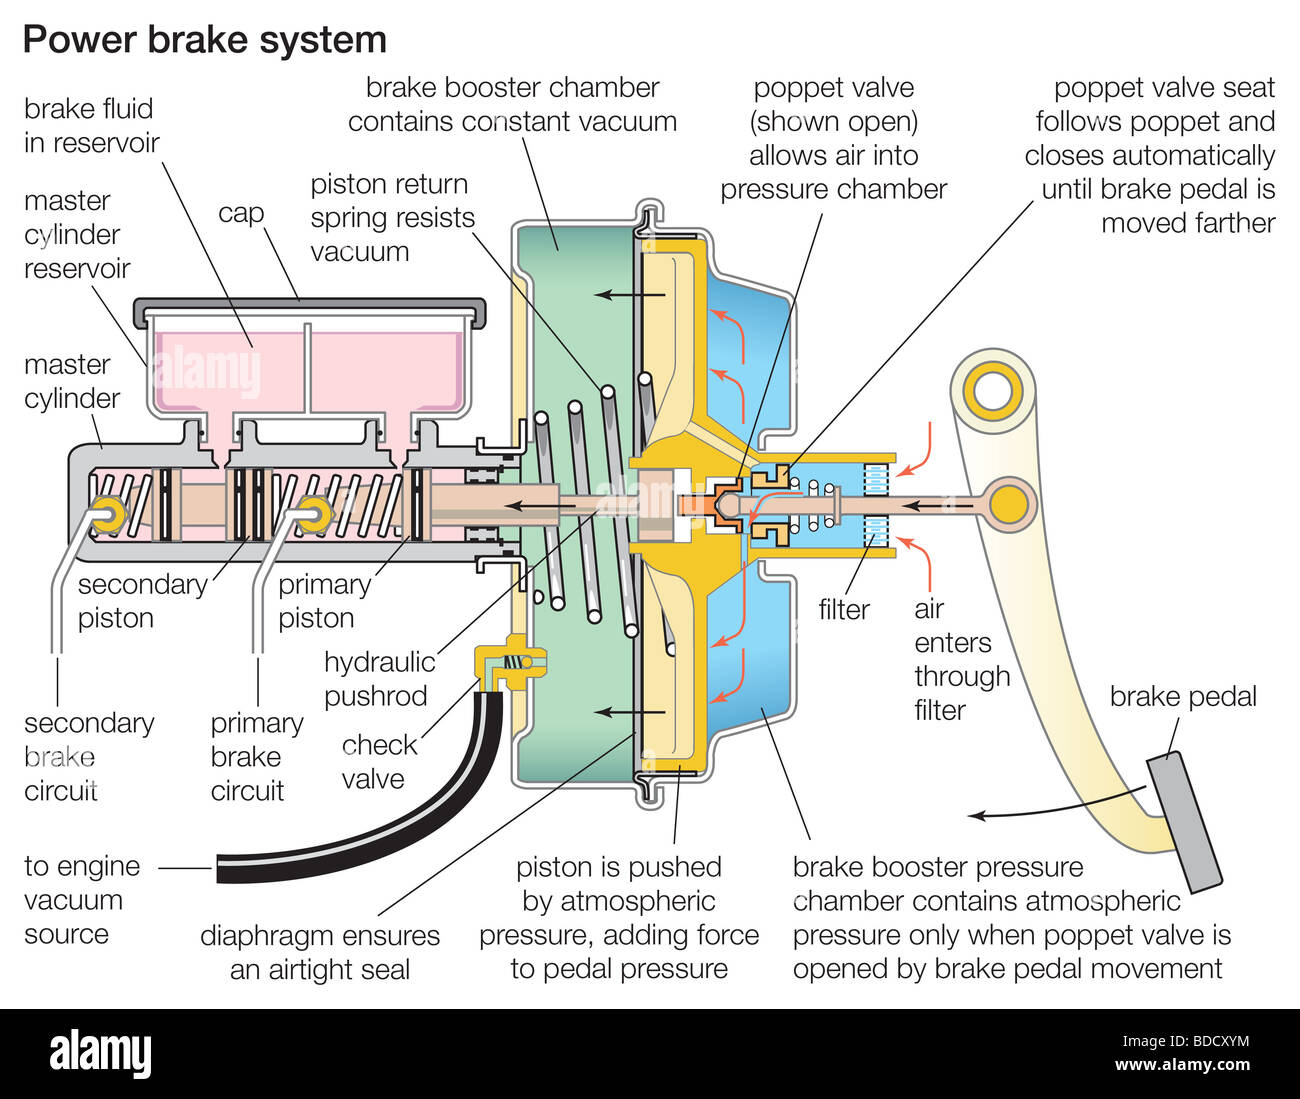 Power Brake System Stock Photo  Royalty Free Image  25485480